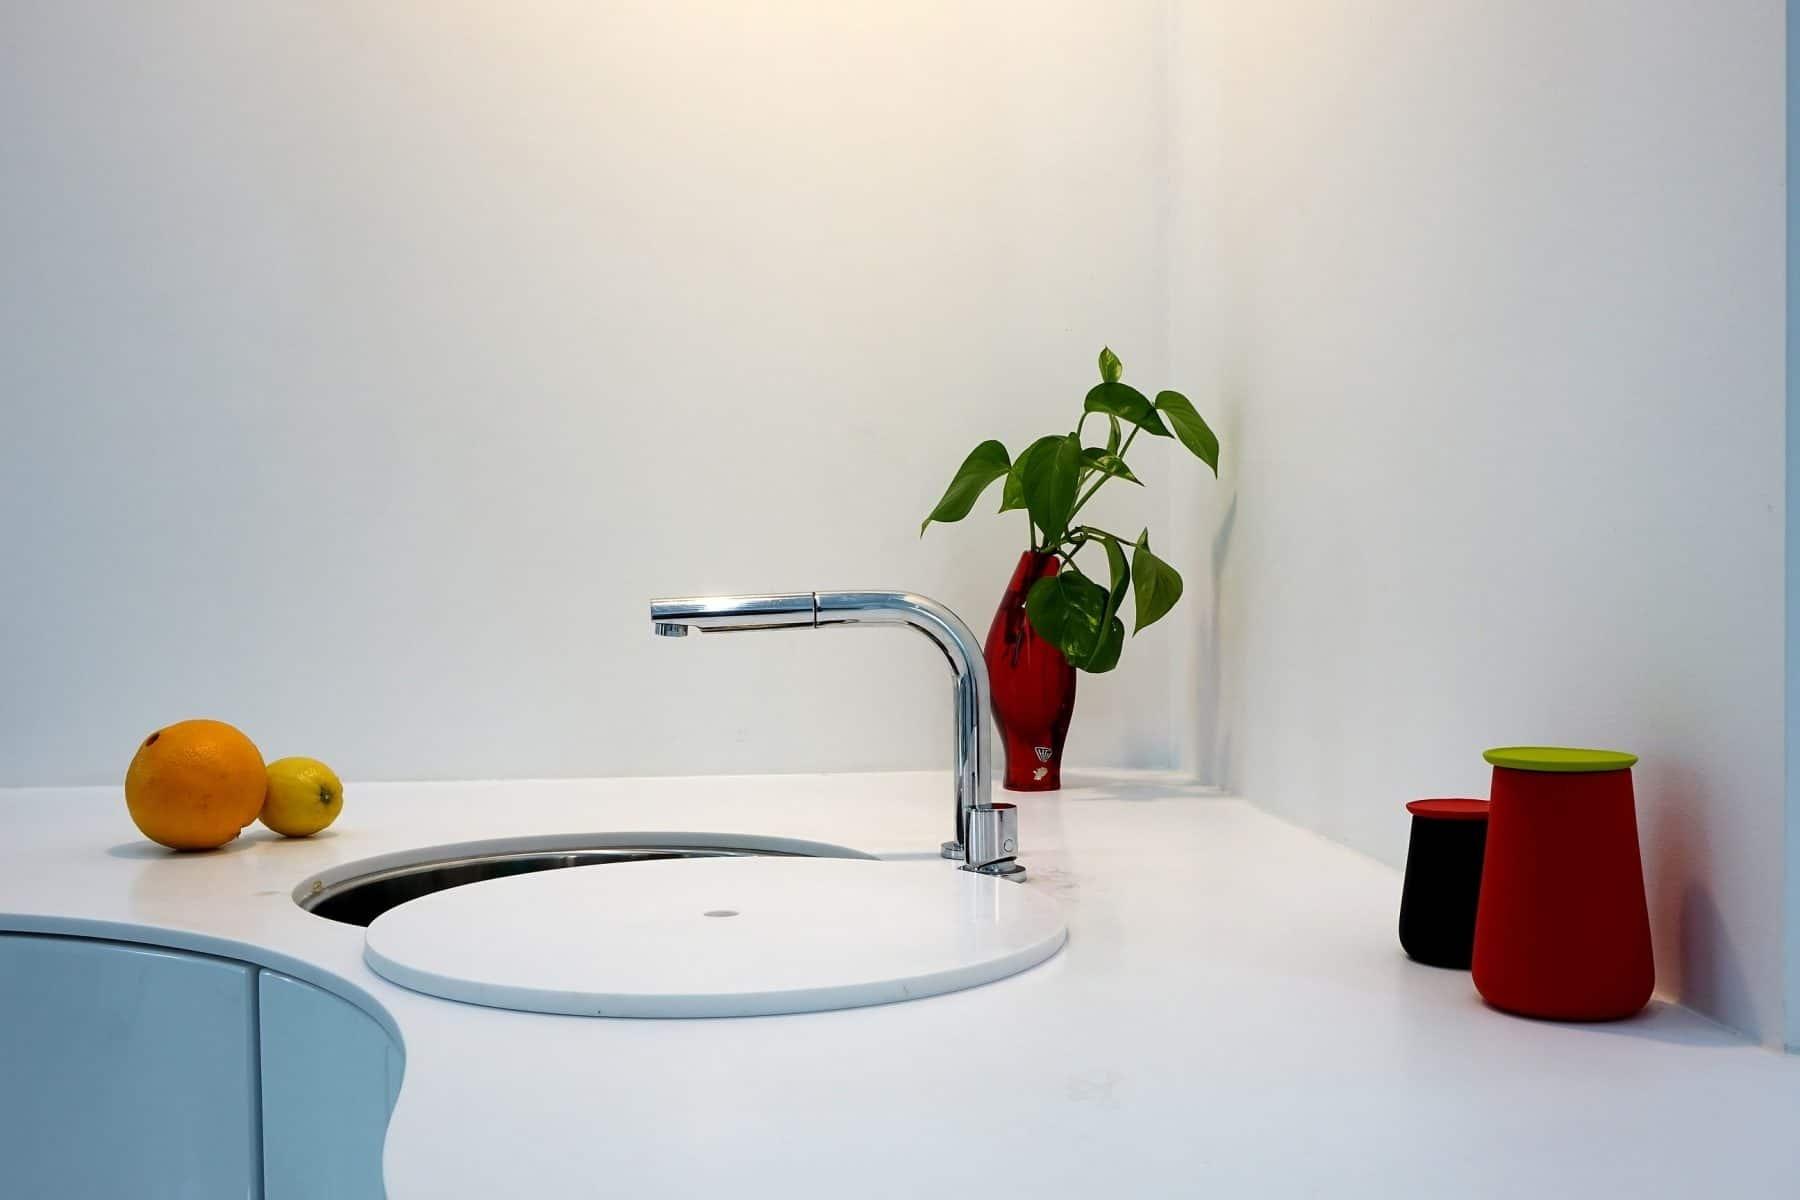 halasz-utca-modern-design-apartment-budapest-dsc00411_filtered_01